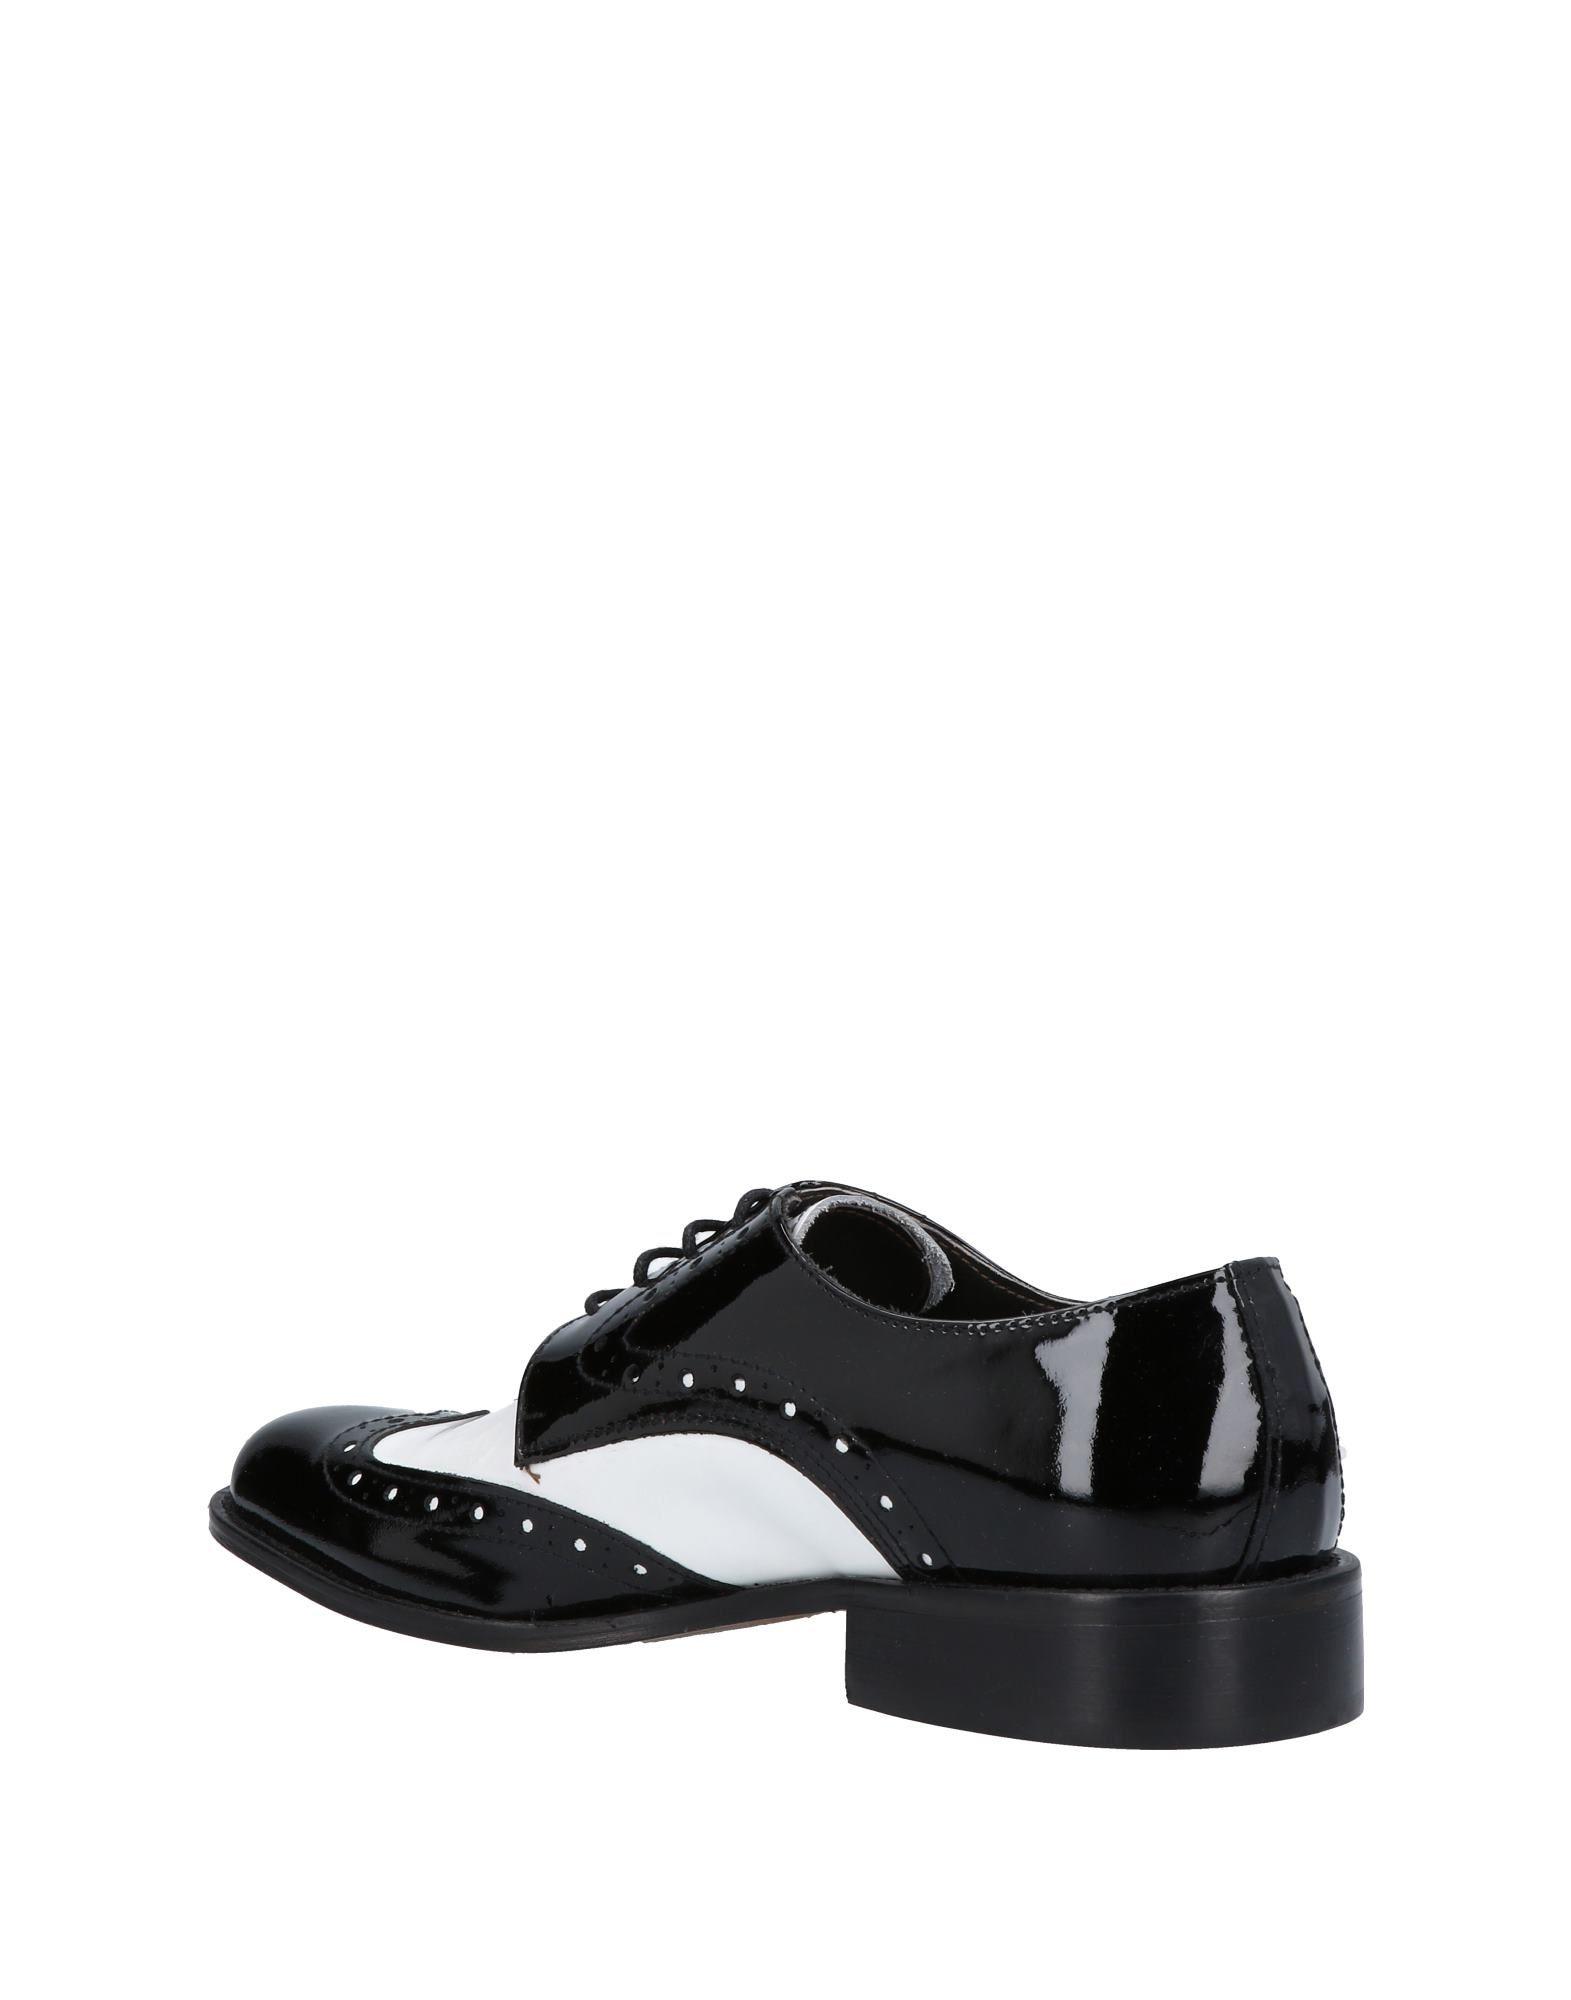 CHAUSSURES - Chaussures à lacetsJohn Bakery C2y7i